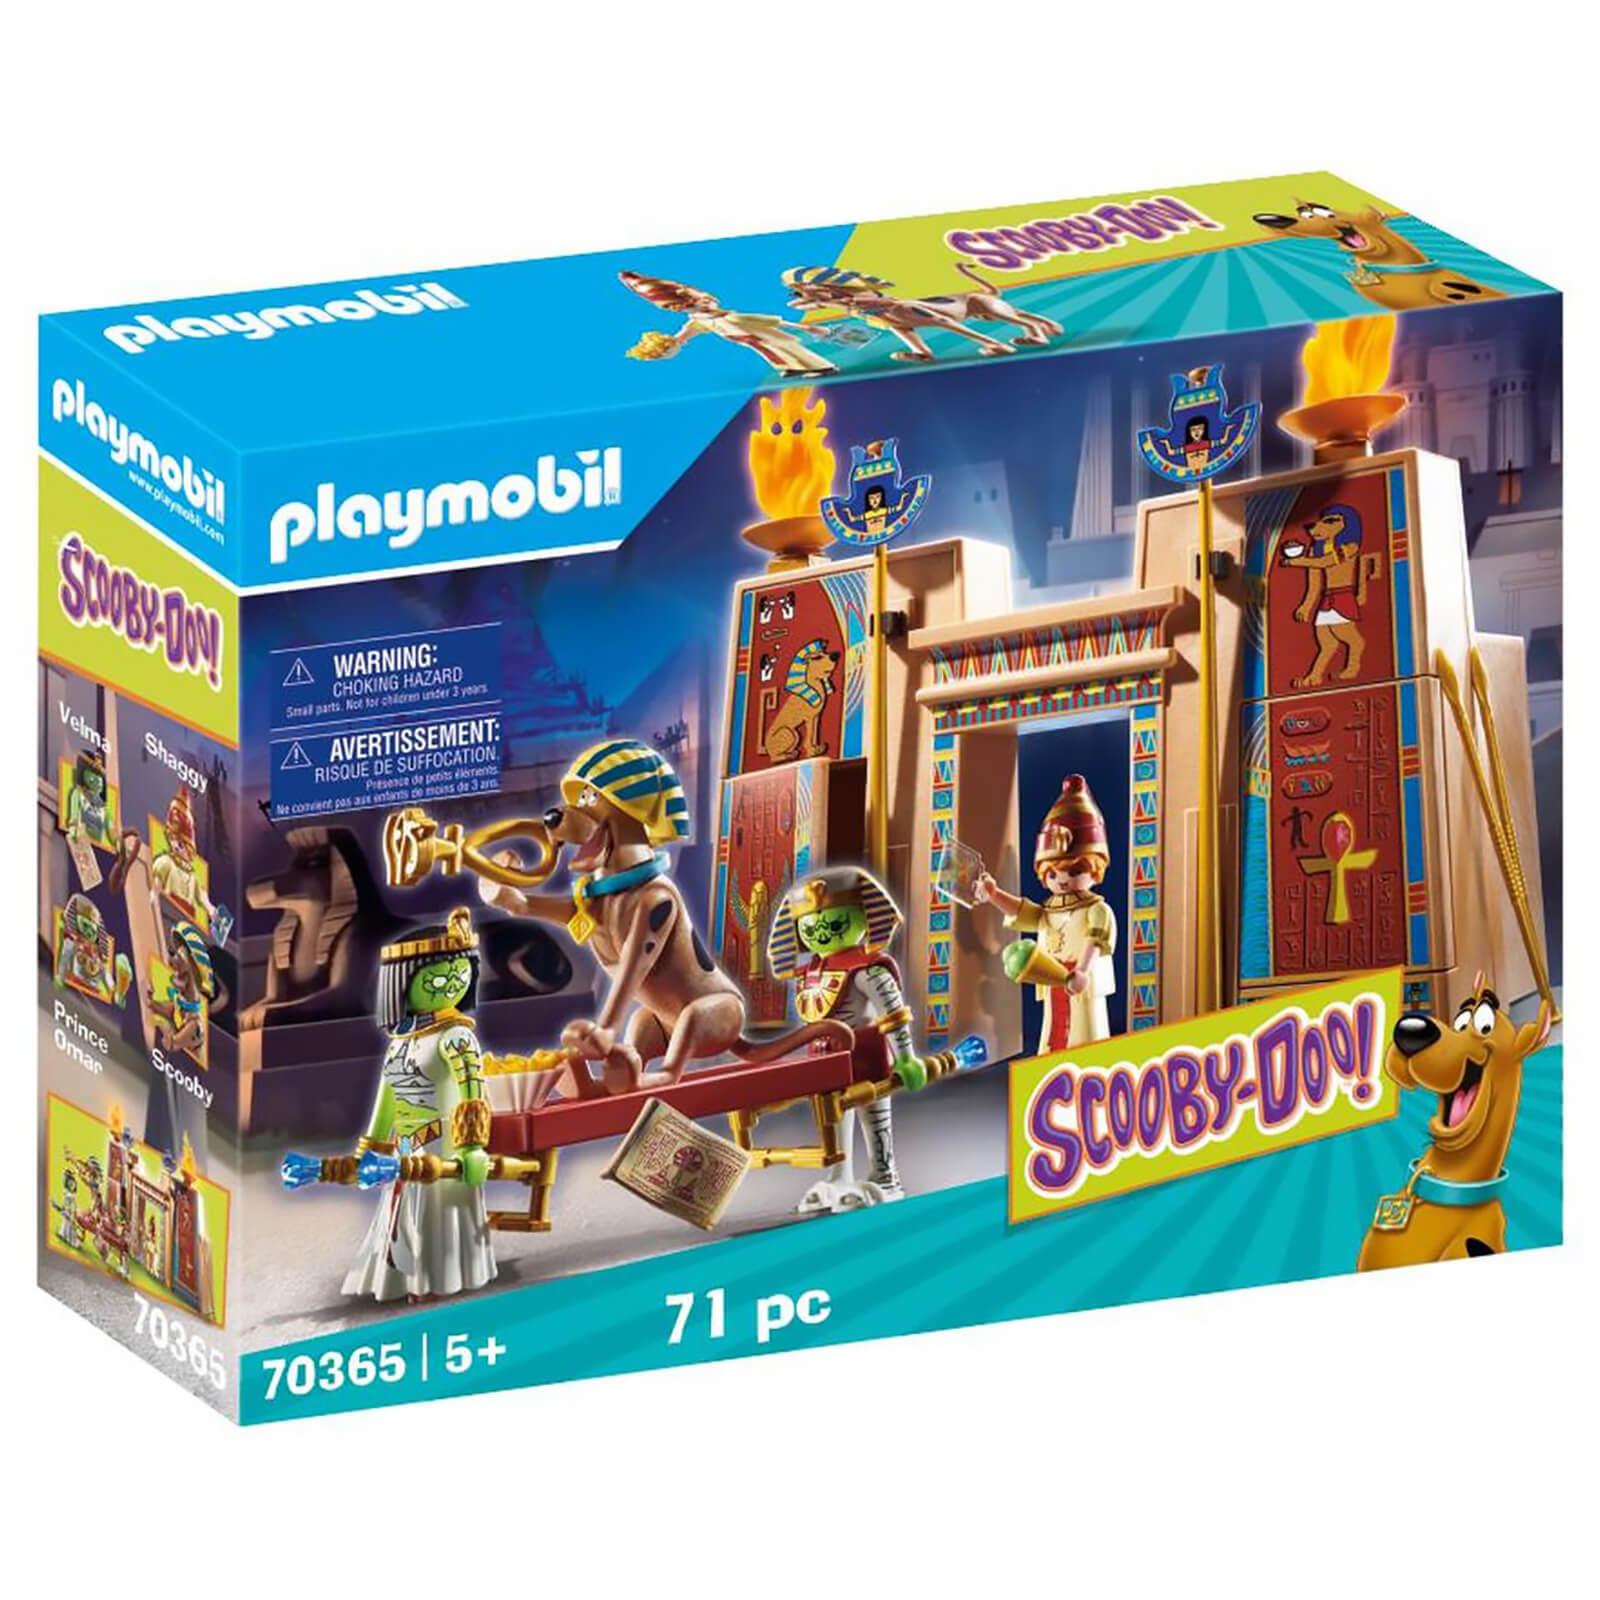 Playmobil Scooby Doo! Adventure In Egypt (70365)